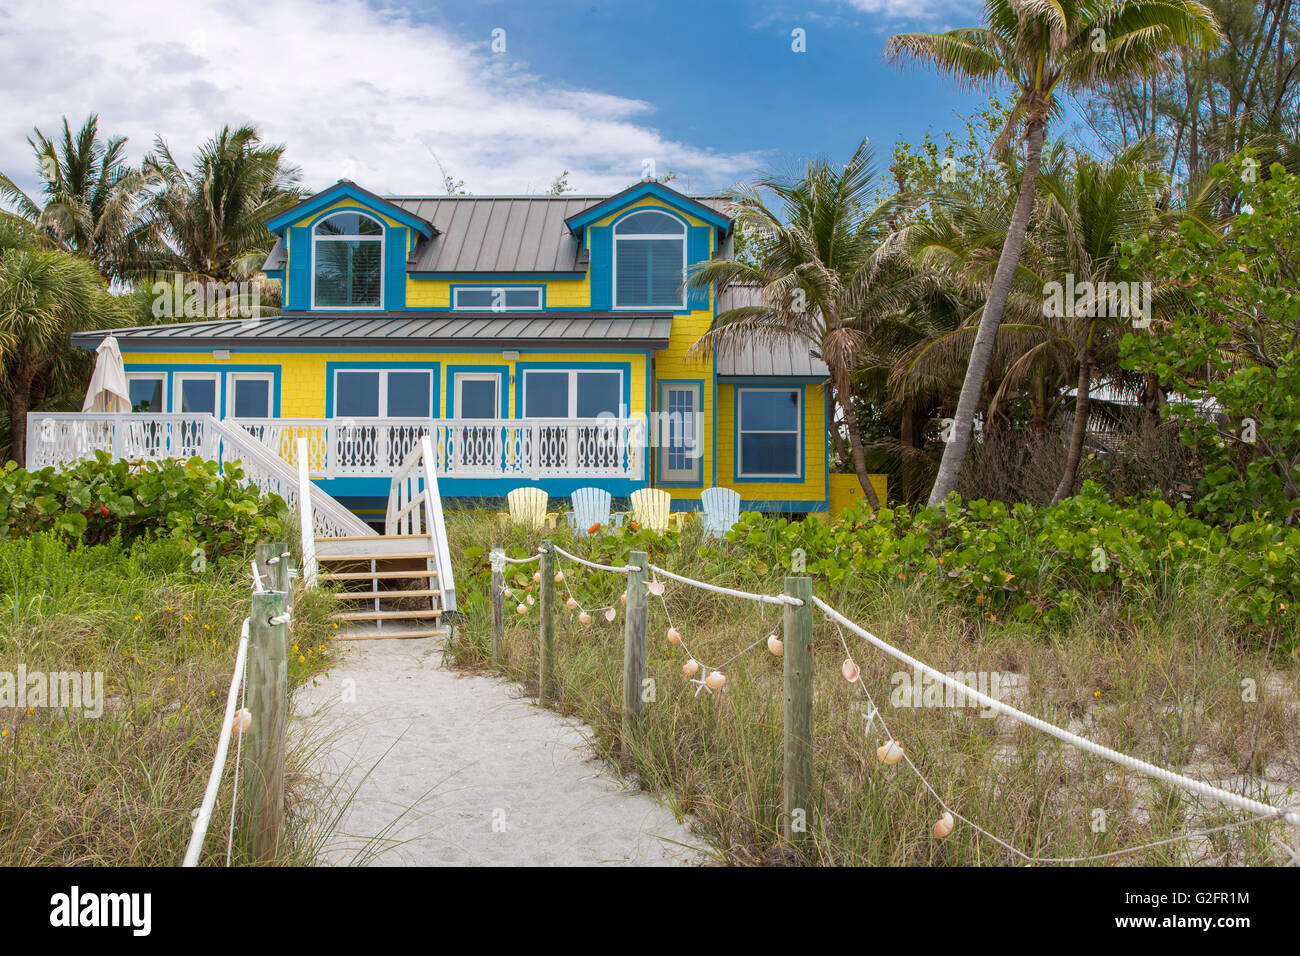 Vacation house on the beach on the Gulf of Mexico on Captiva Island Florida Stock Photo